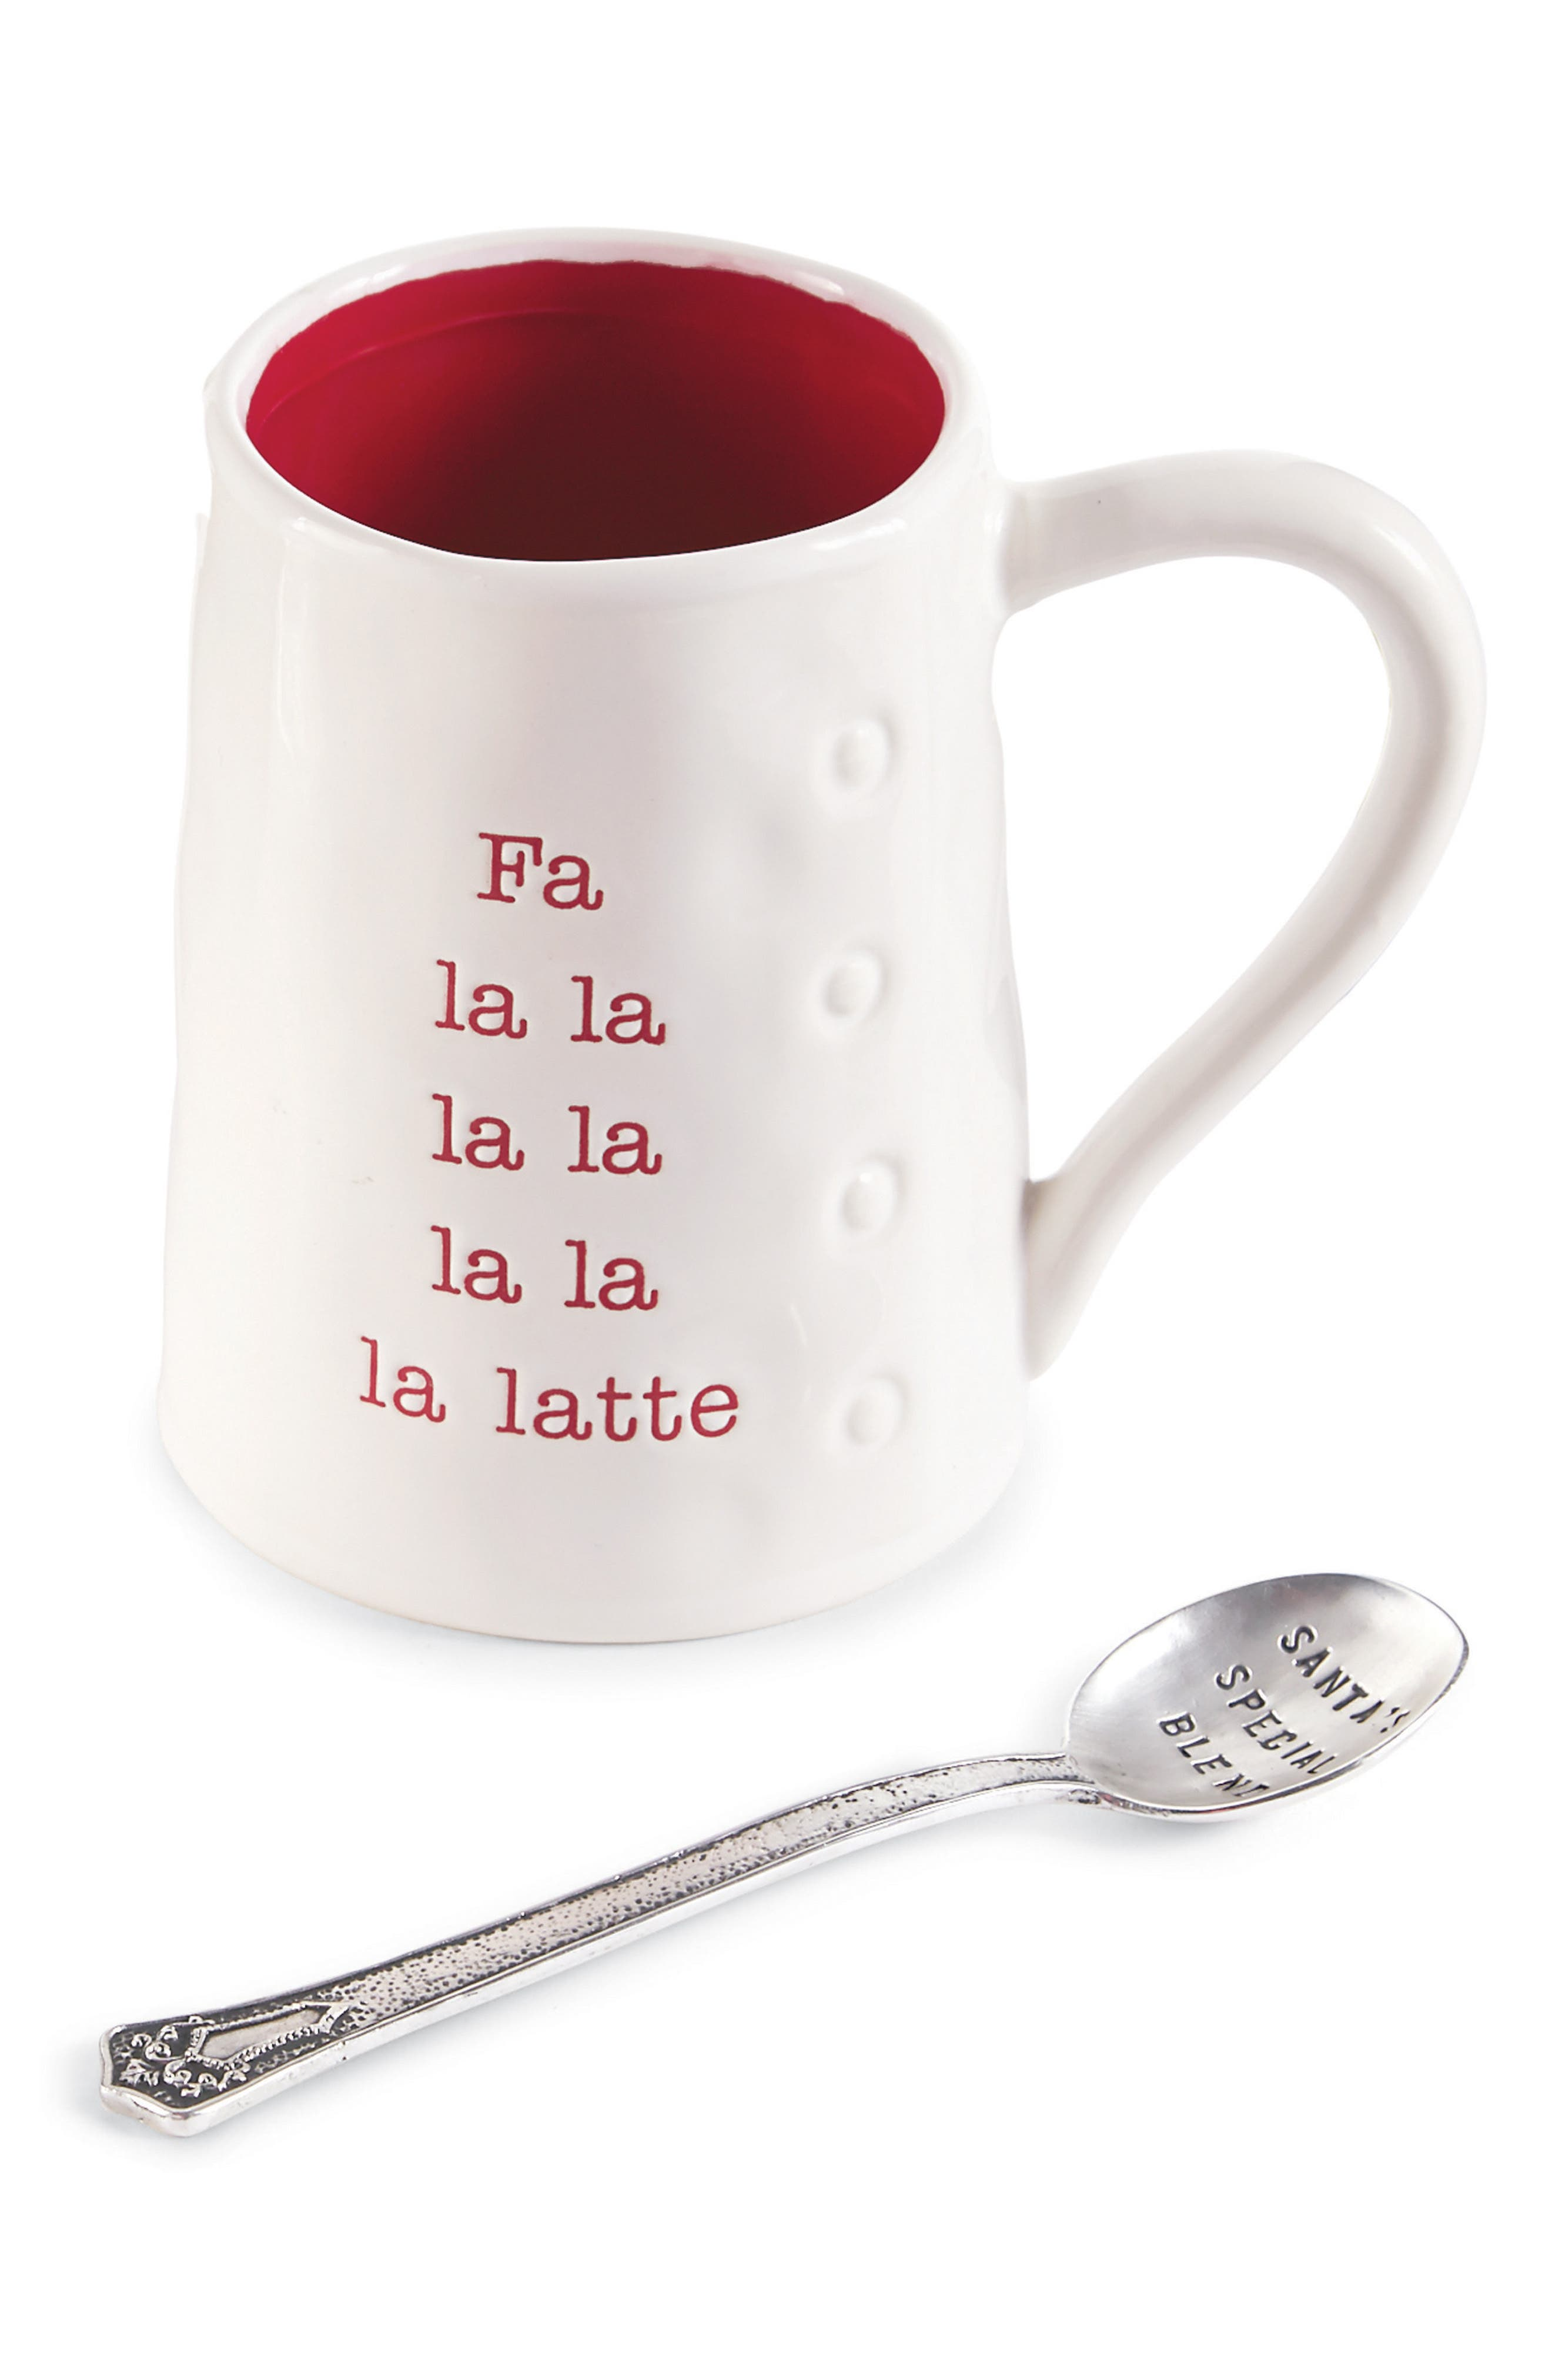 Main Image - Mud Pie Fa La Latte Ceramic Mug & Spoon